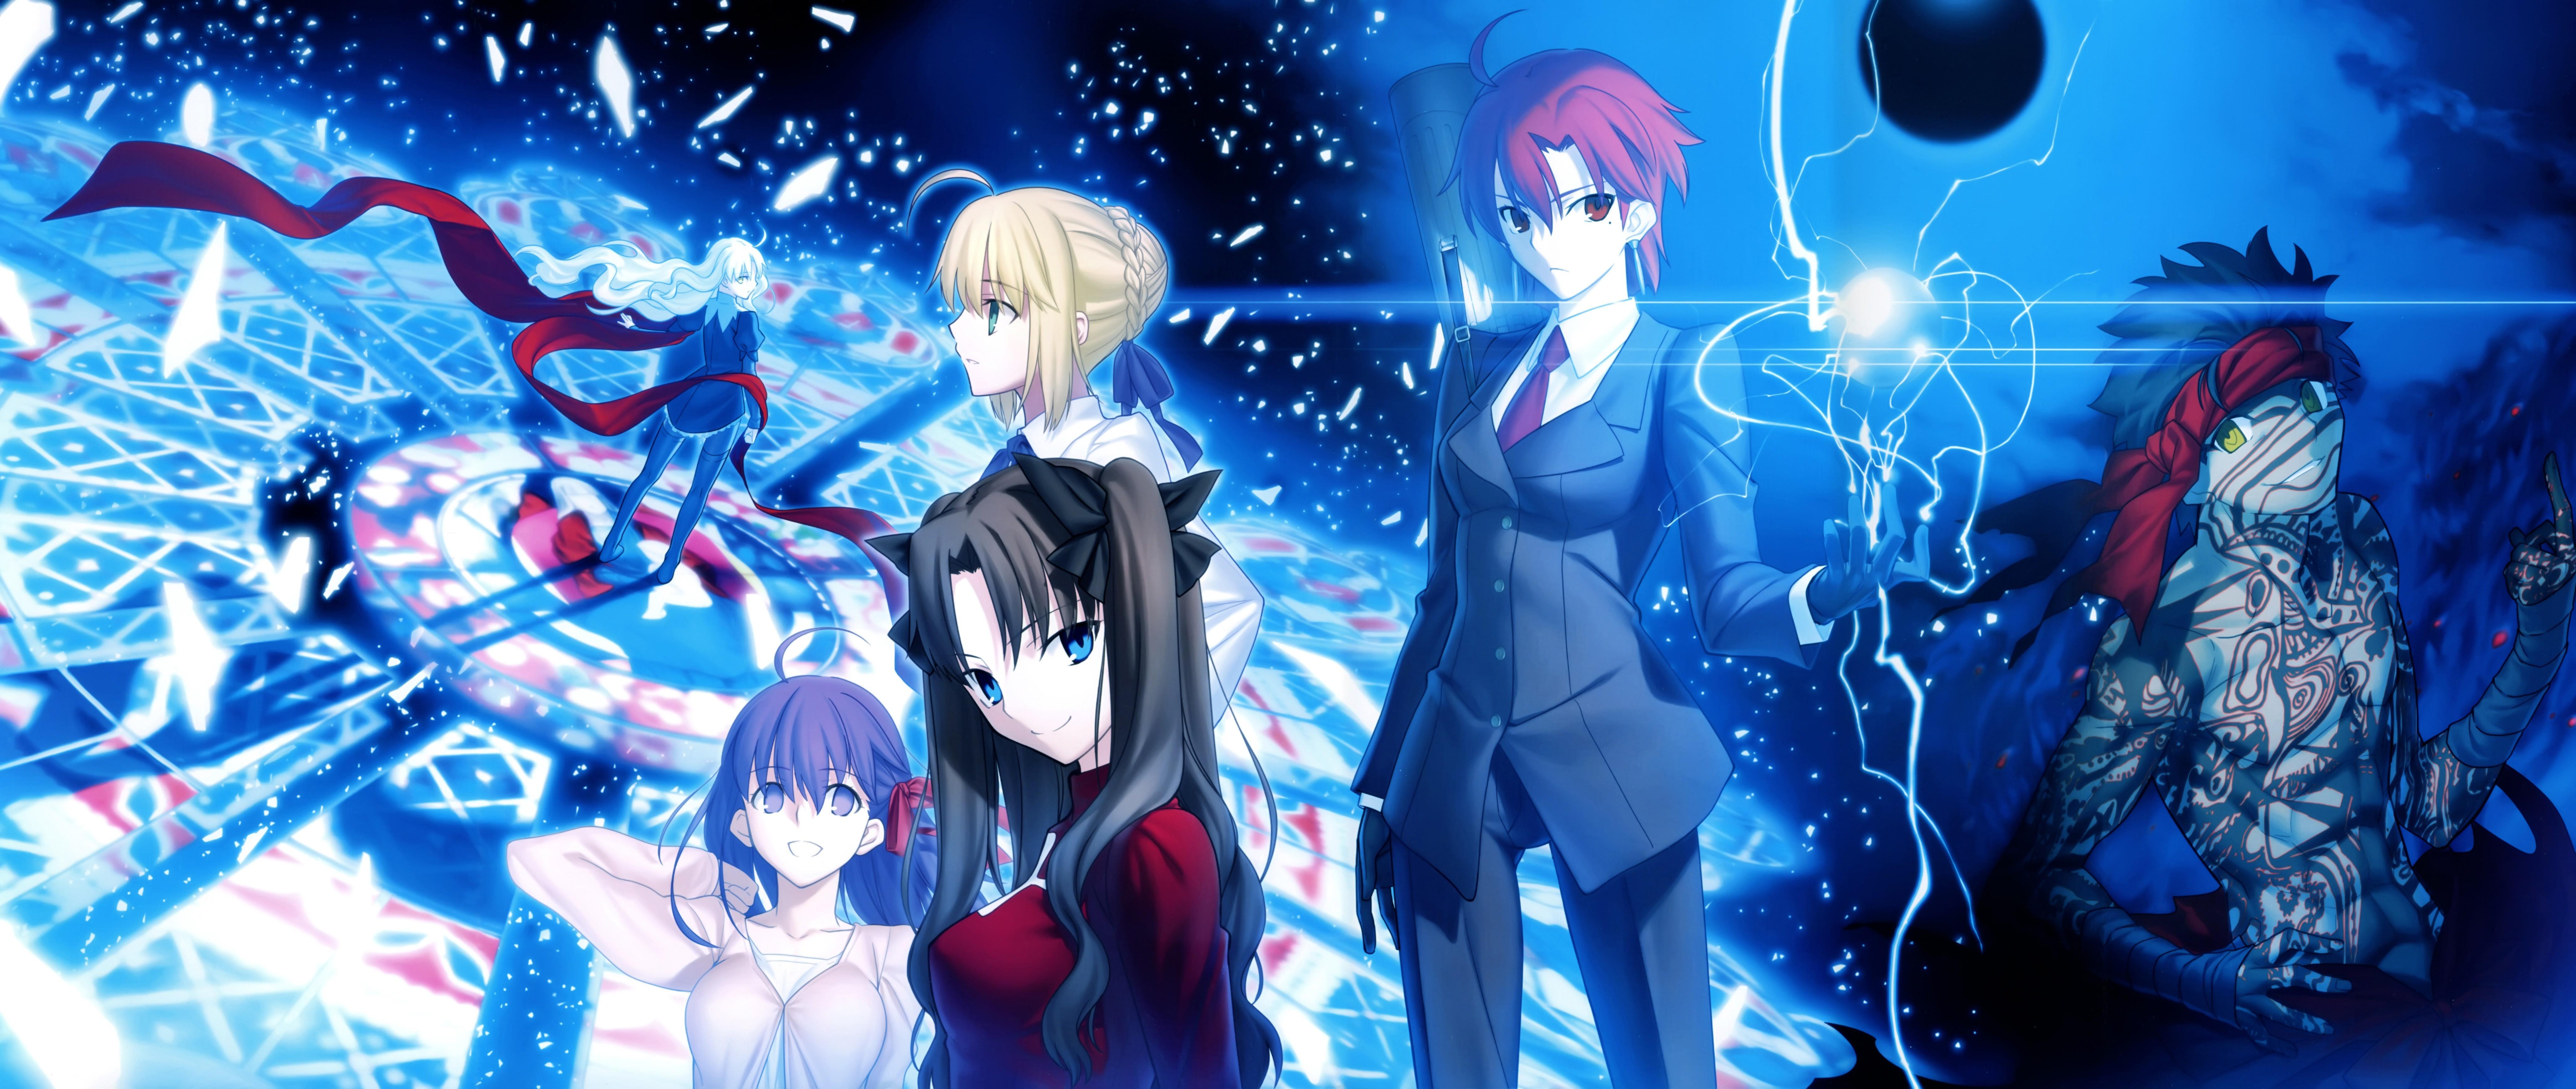 Wallpaper Illustration Anime Girls Saber Fate Series Type